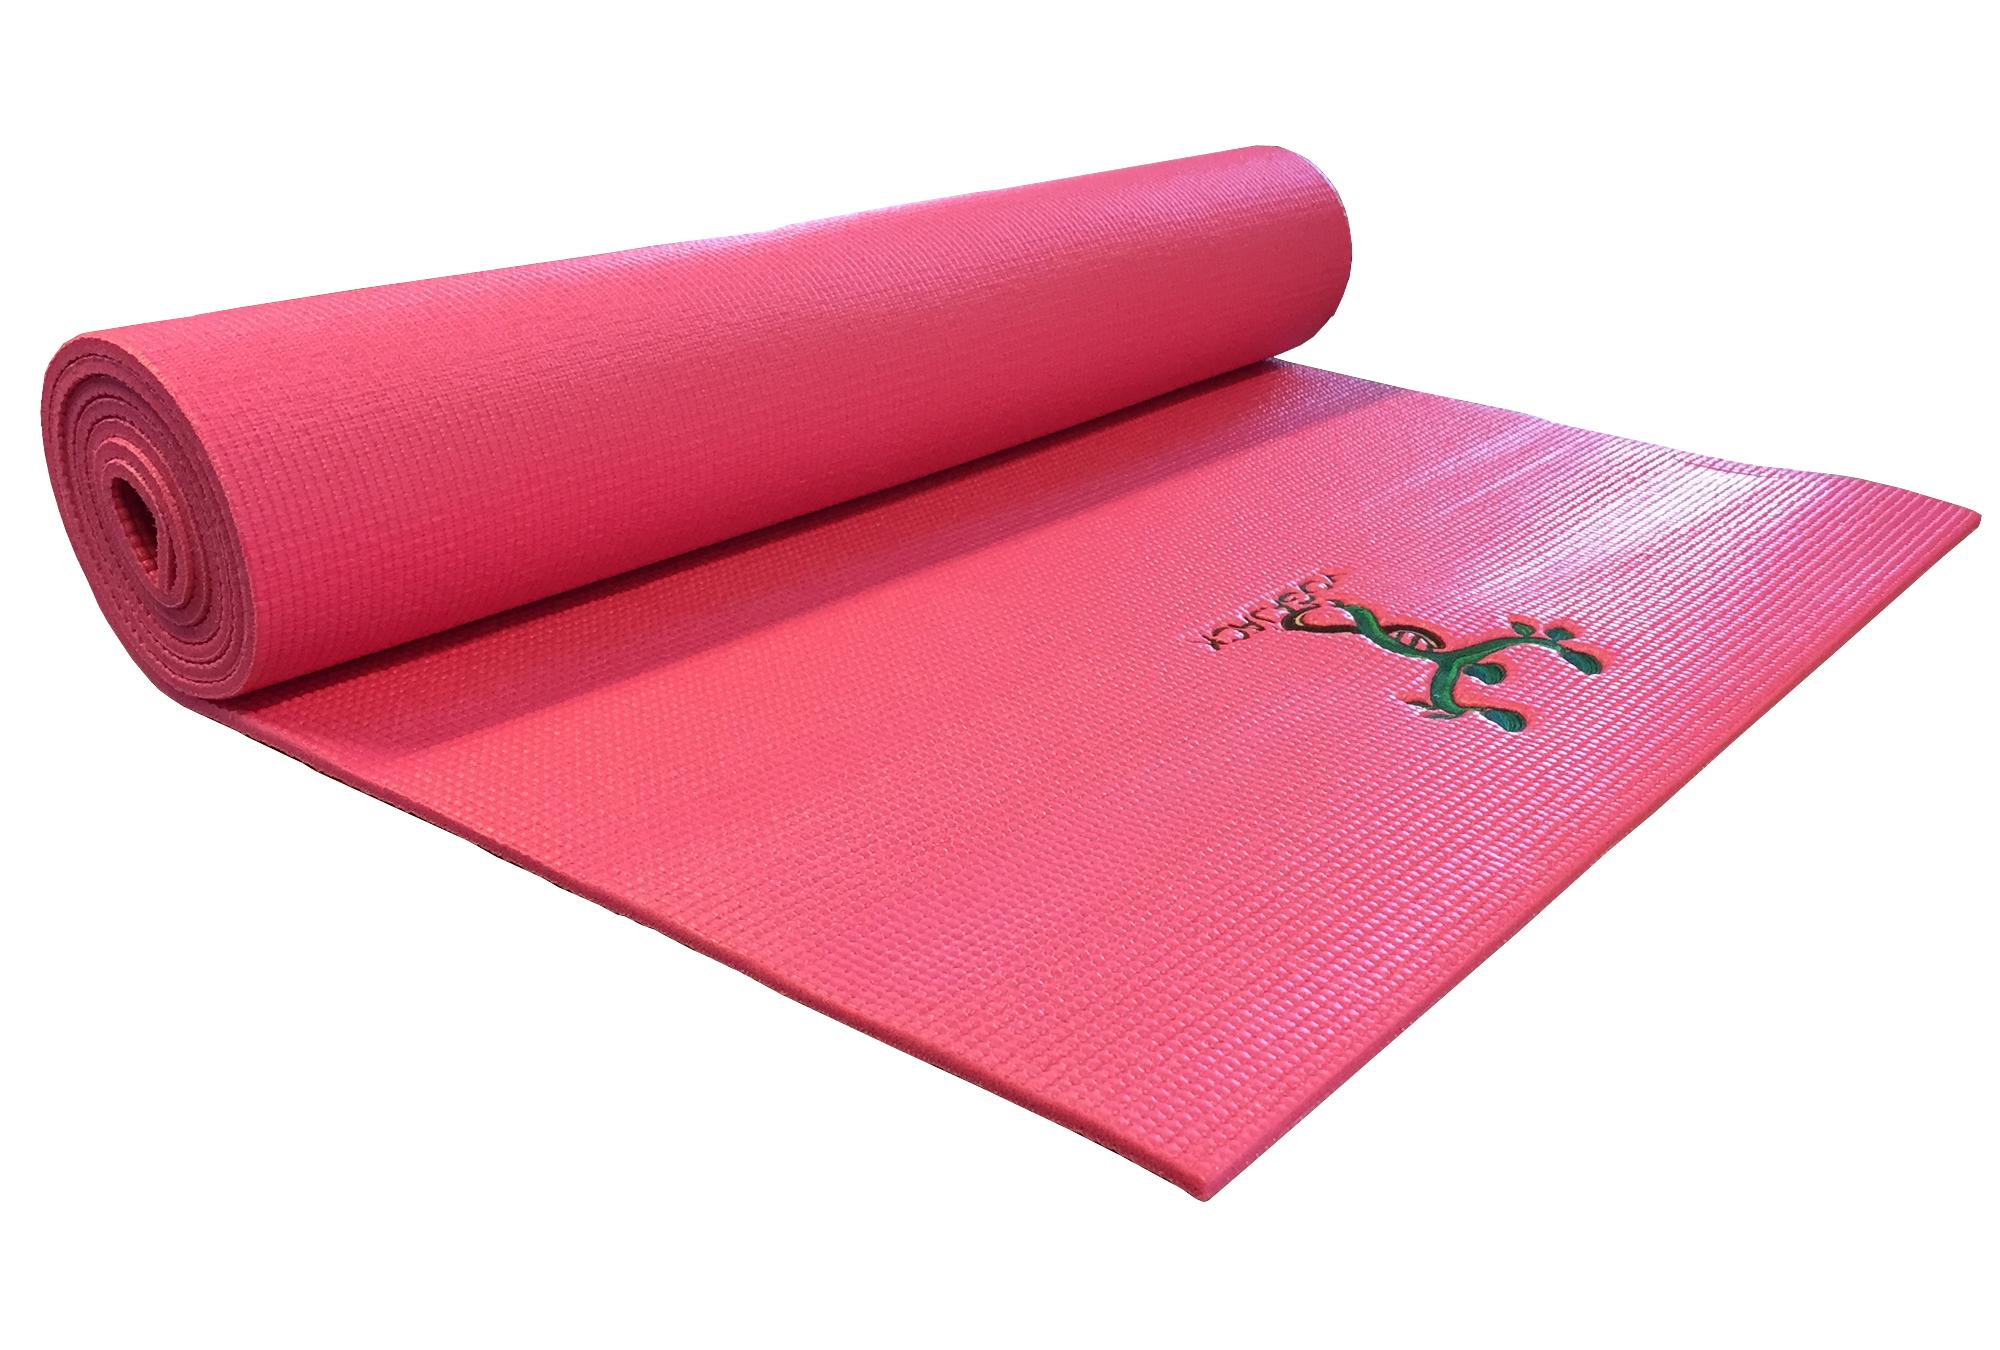 mat jute natural and barefoot friendly mats resin per co yoga environmental eco polymer mens